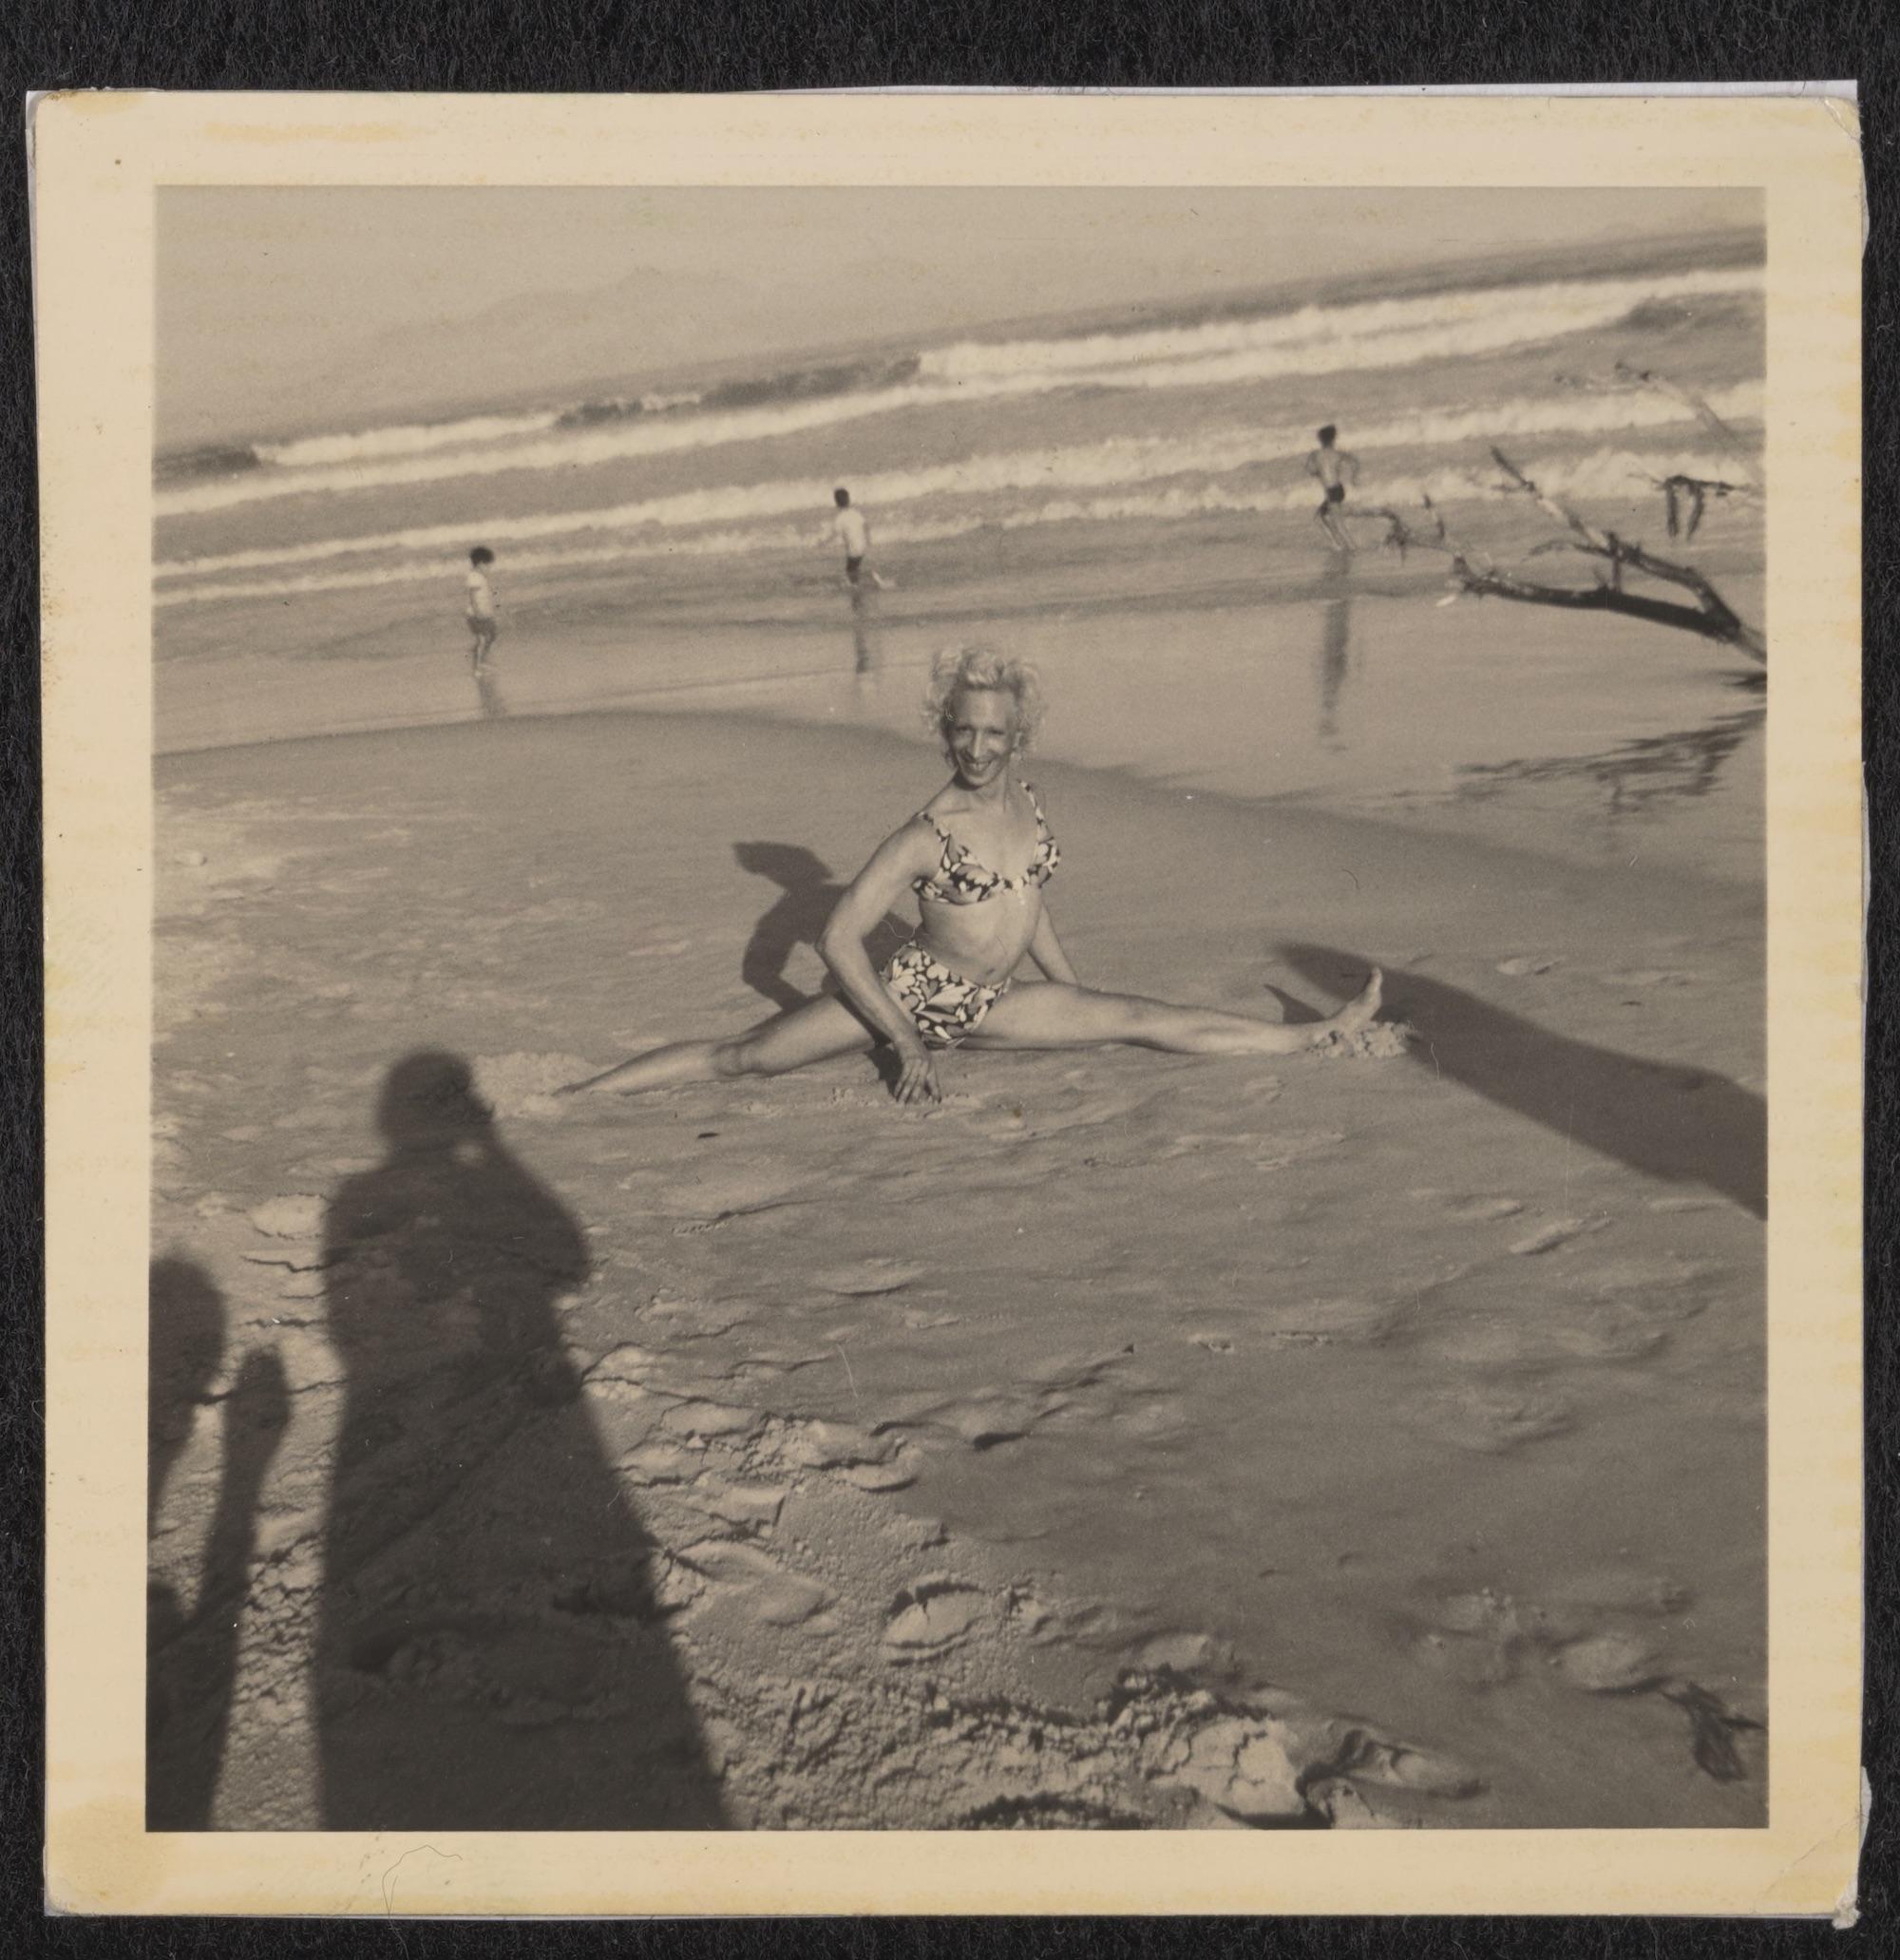 Kewpie Doing a Split at Strandfontein Beach, circa 1975 to 1979